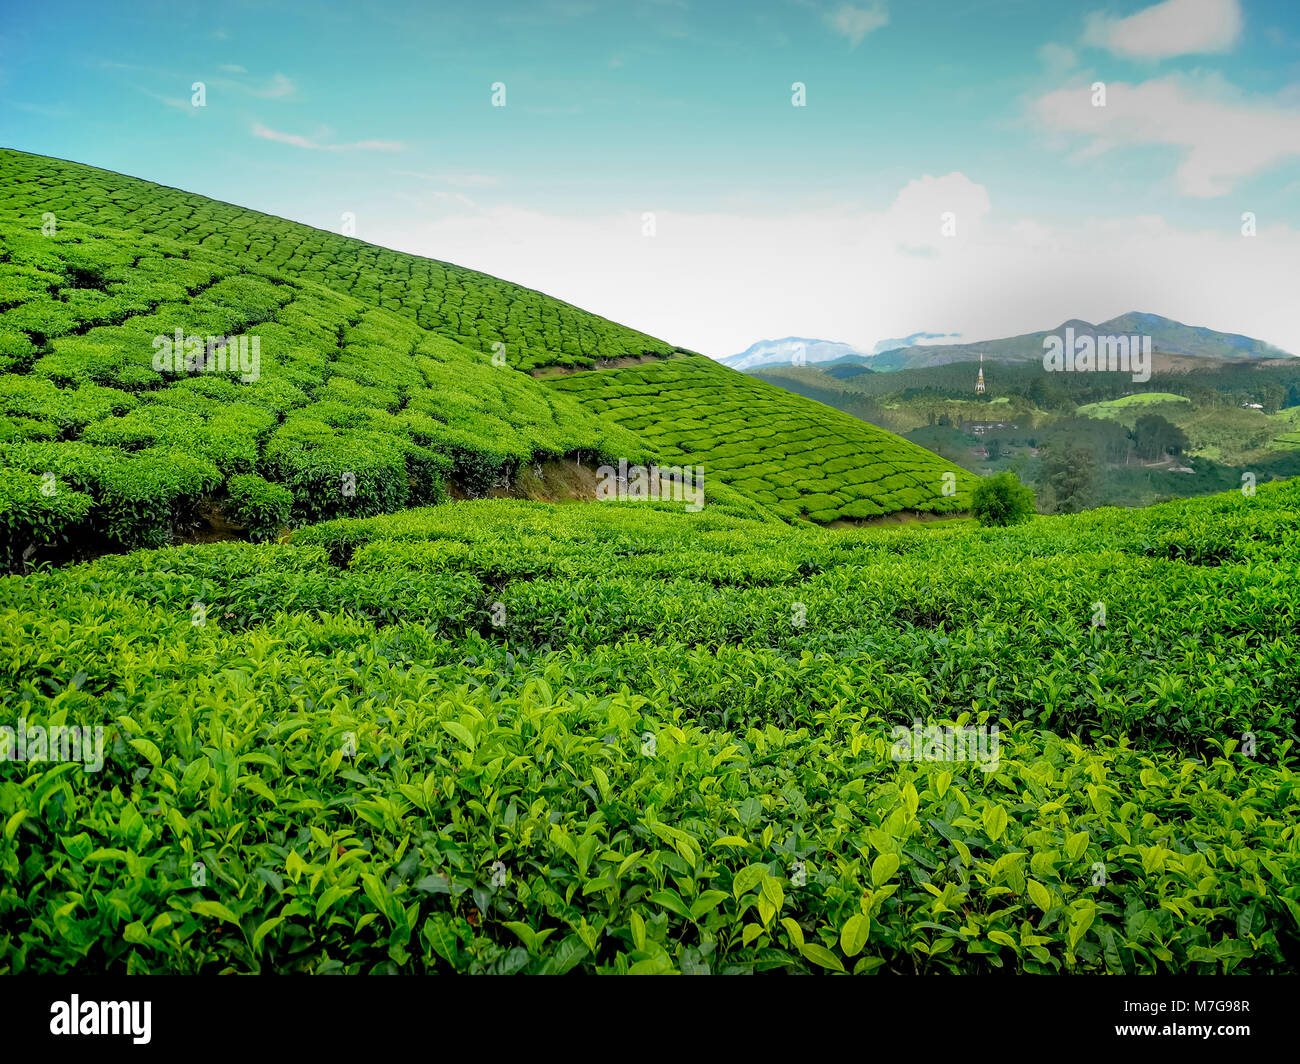 MUNNAR, KERALA, INDIA - DEC. 14, 2011: Bright and vivid landscape of Green tea plantations in Munnar in western - Stock Image